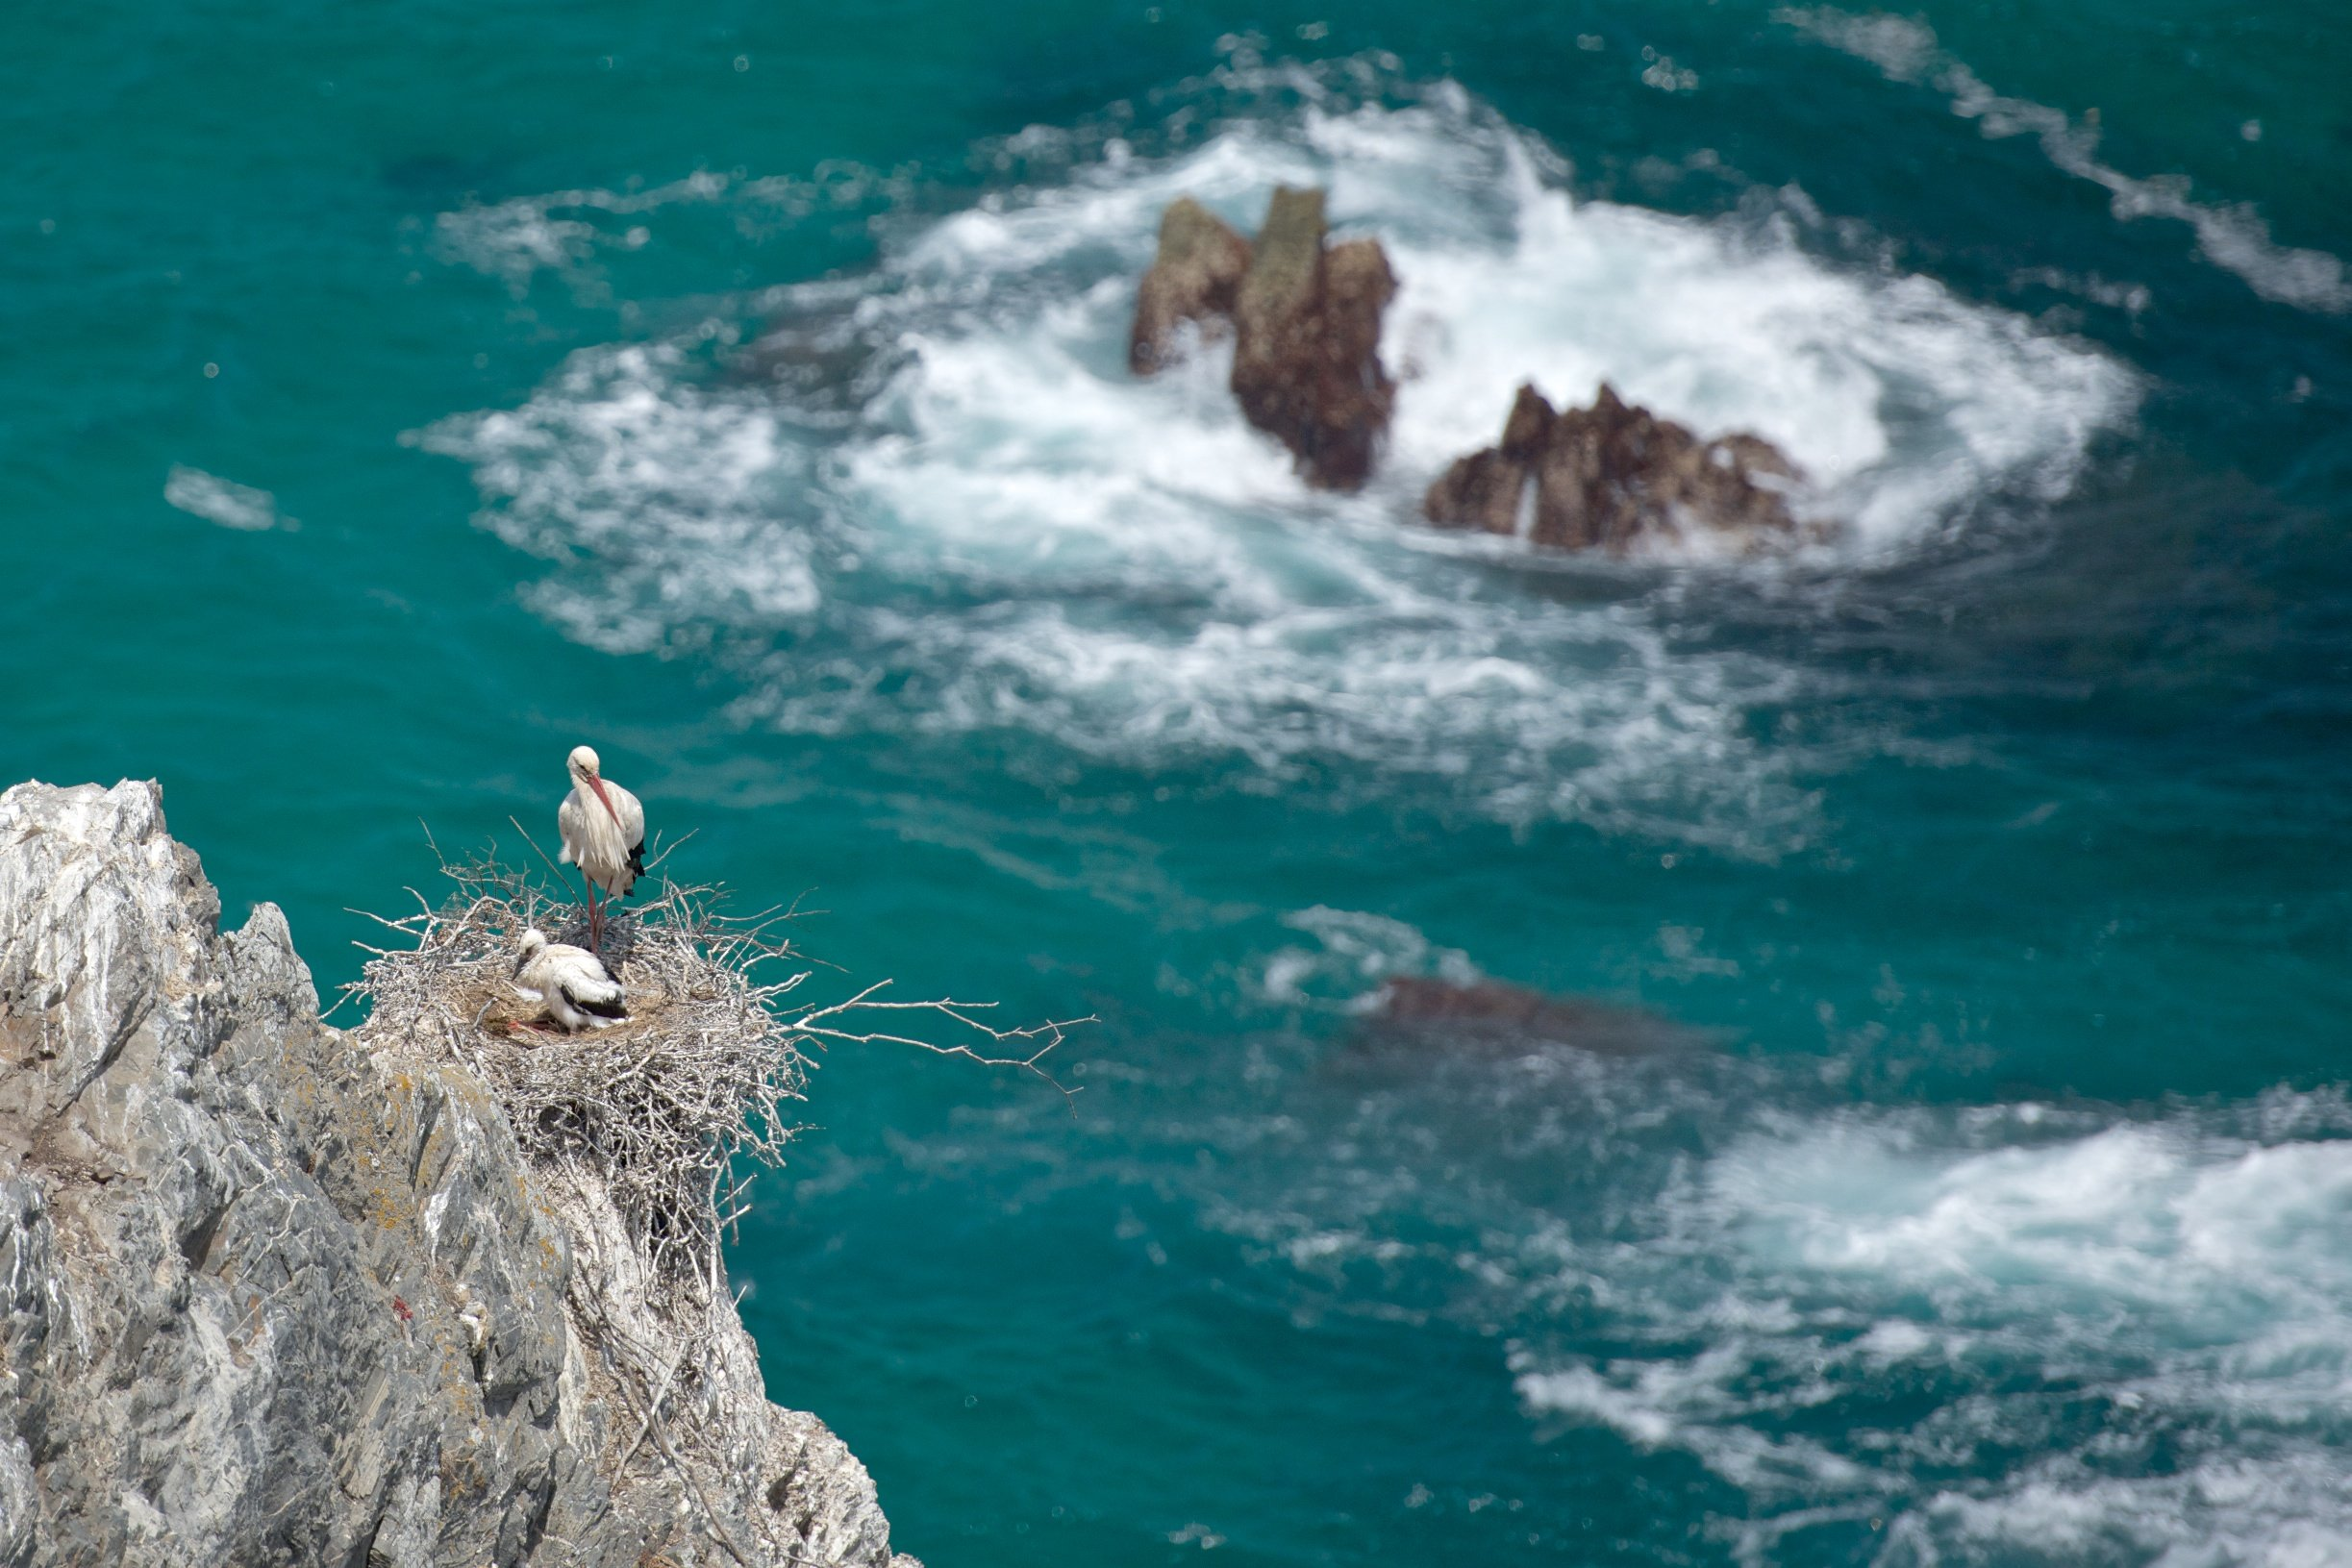 путешествия, португалия, птицы, океан, природа, nikon, d810, travel, nature, birds, portugal, ocean, Виктор Гундарев